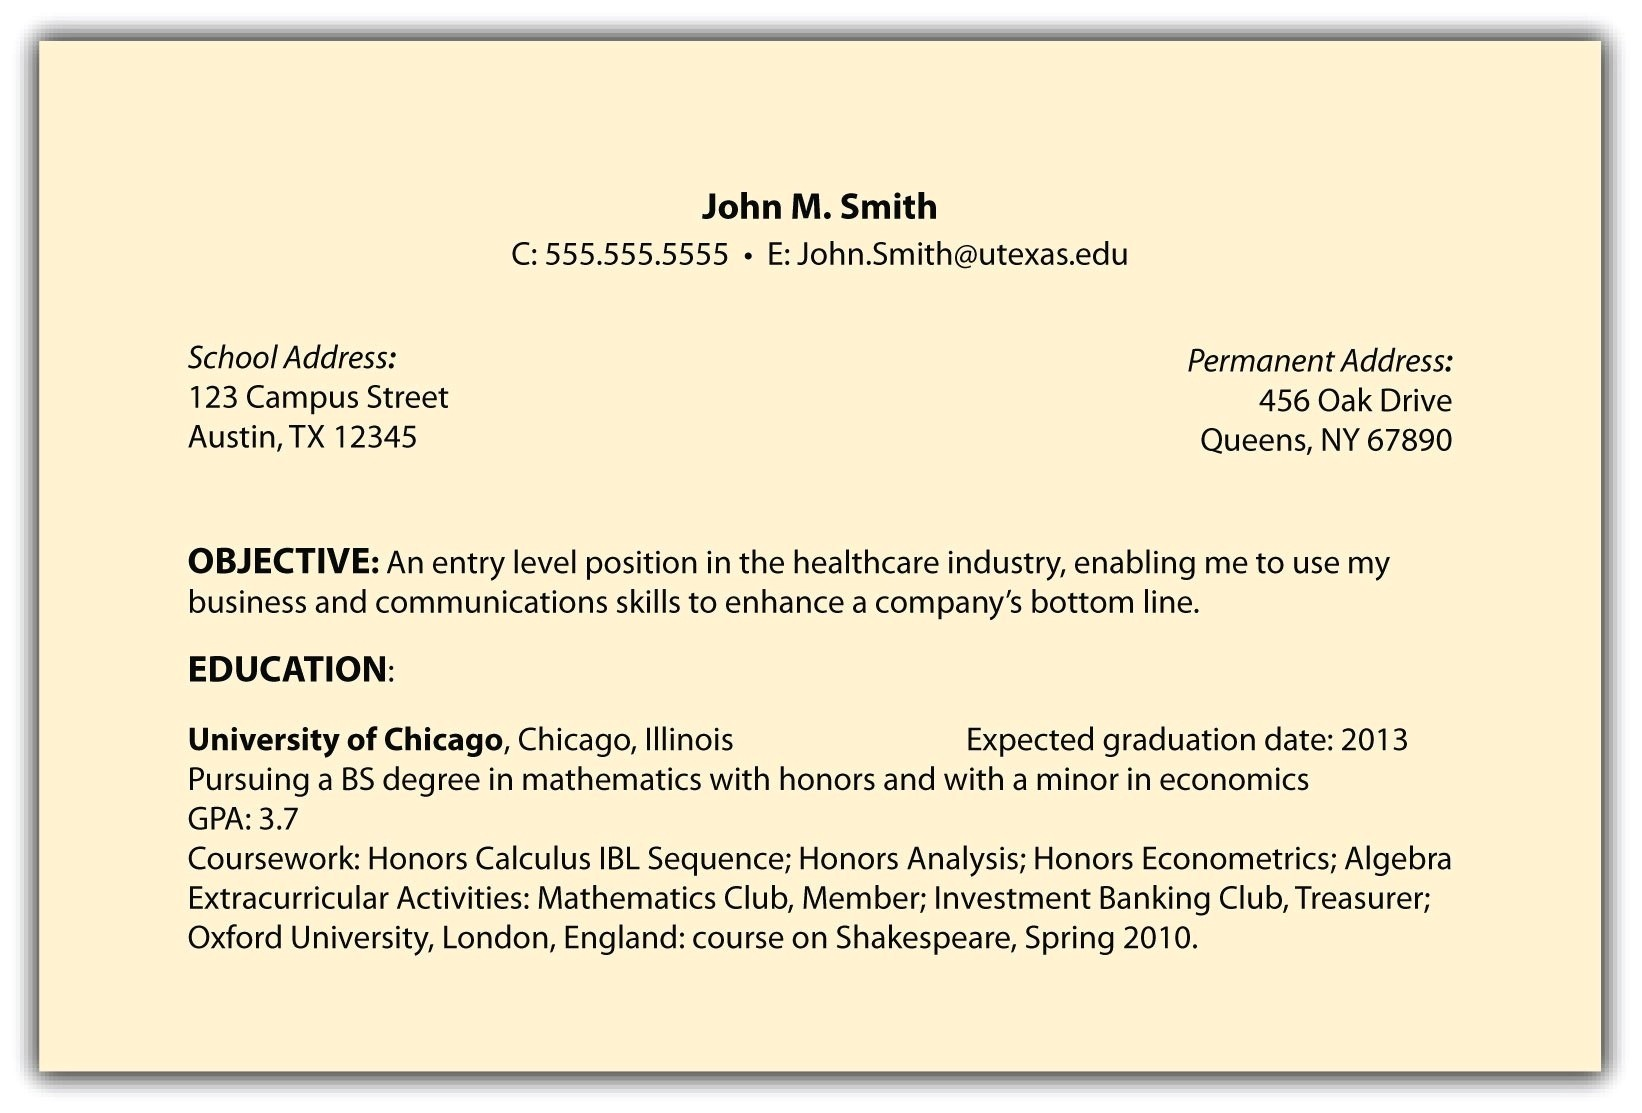 Resume Sample Objectives Career Objective On Resume Template Resume Builder